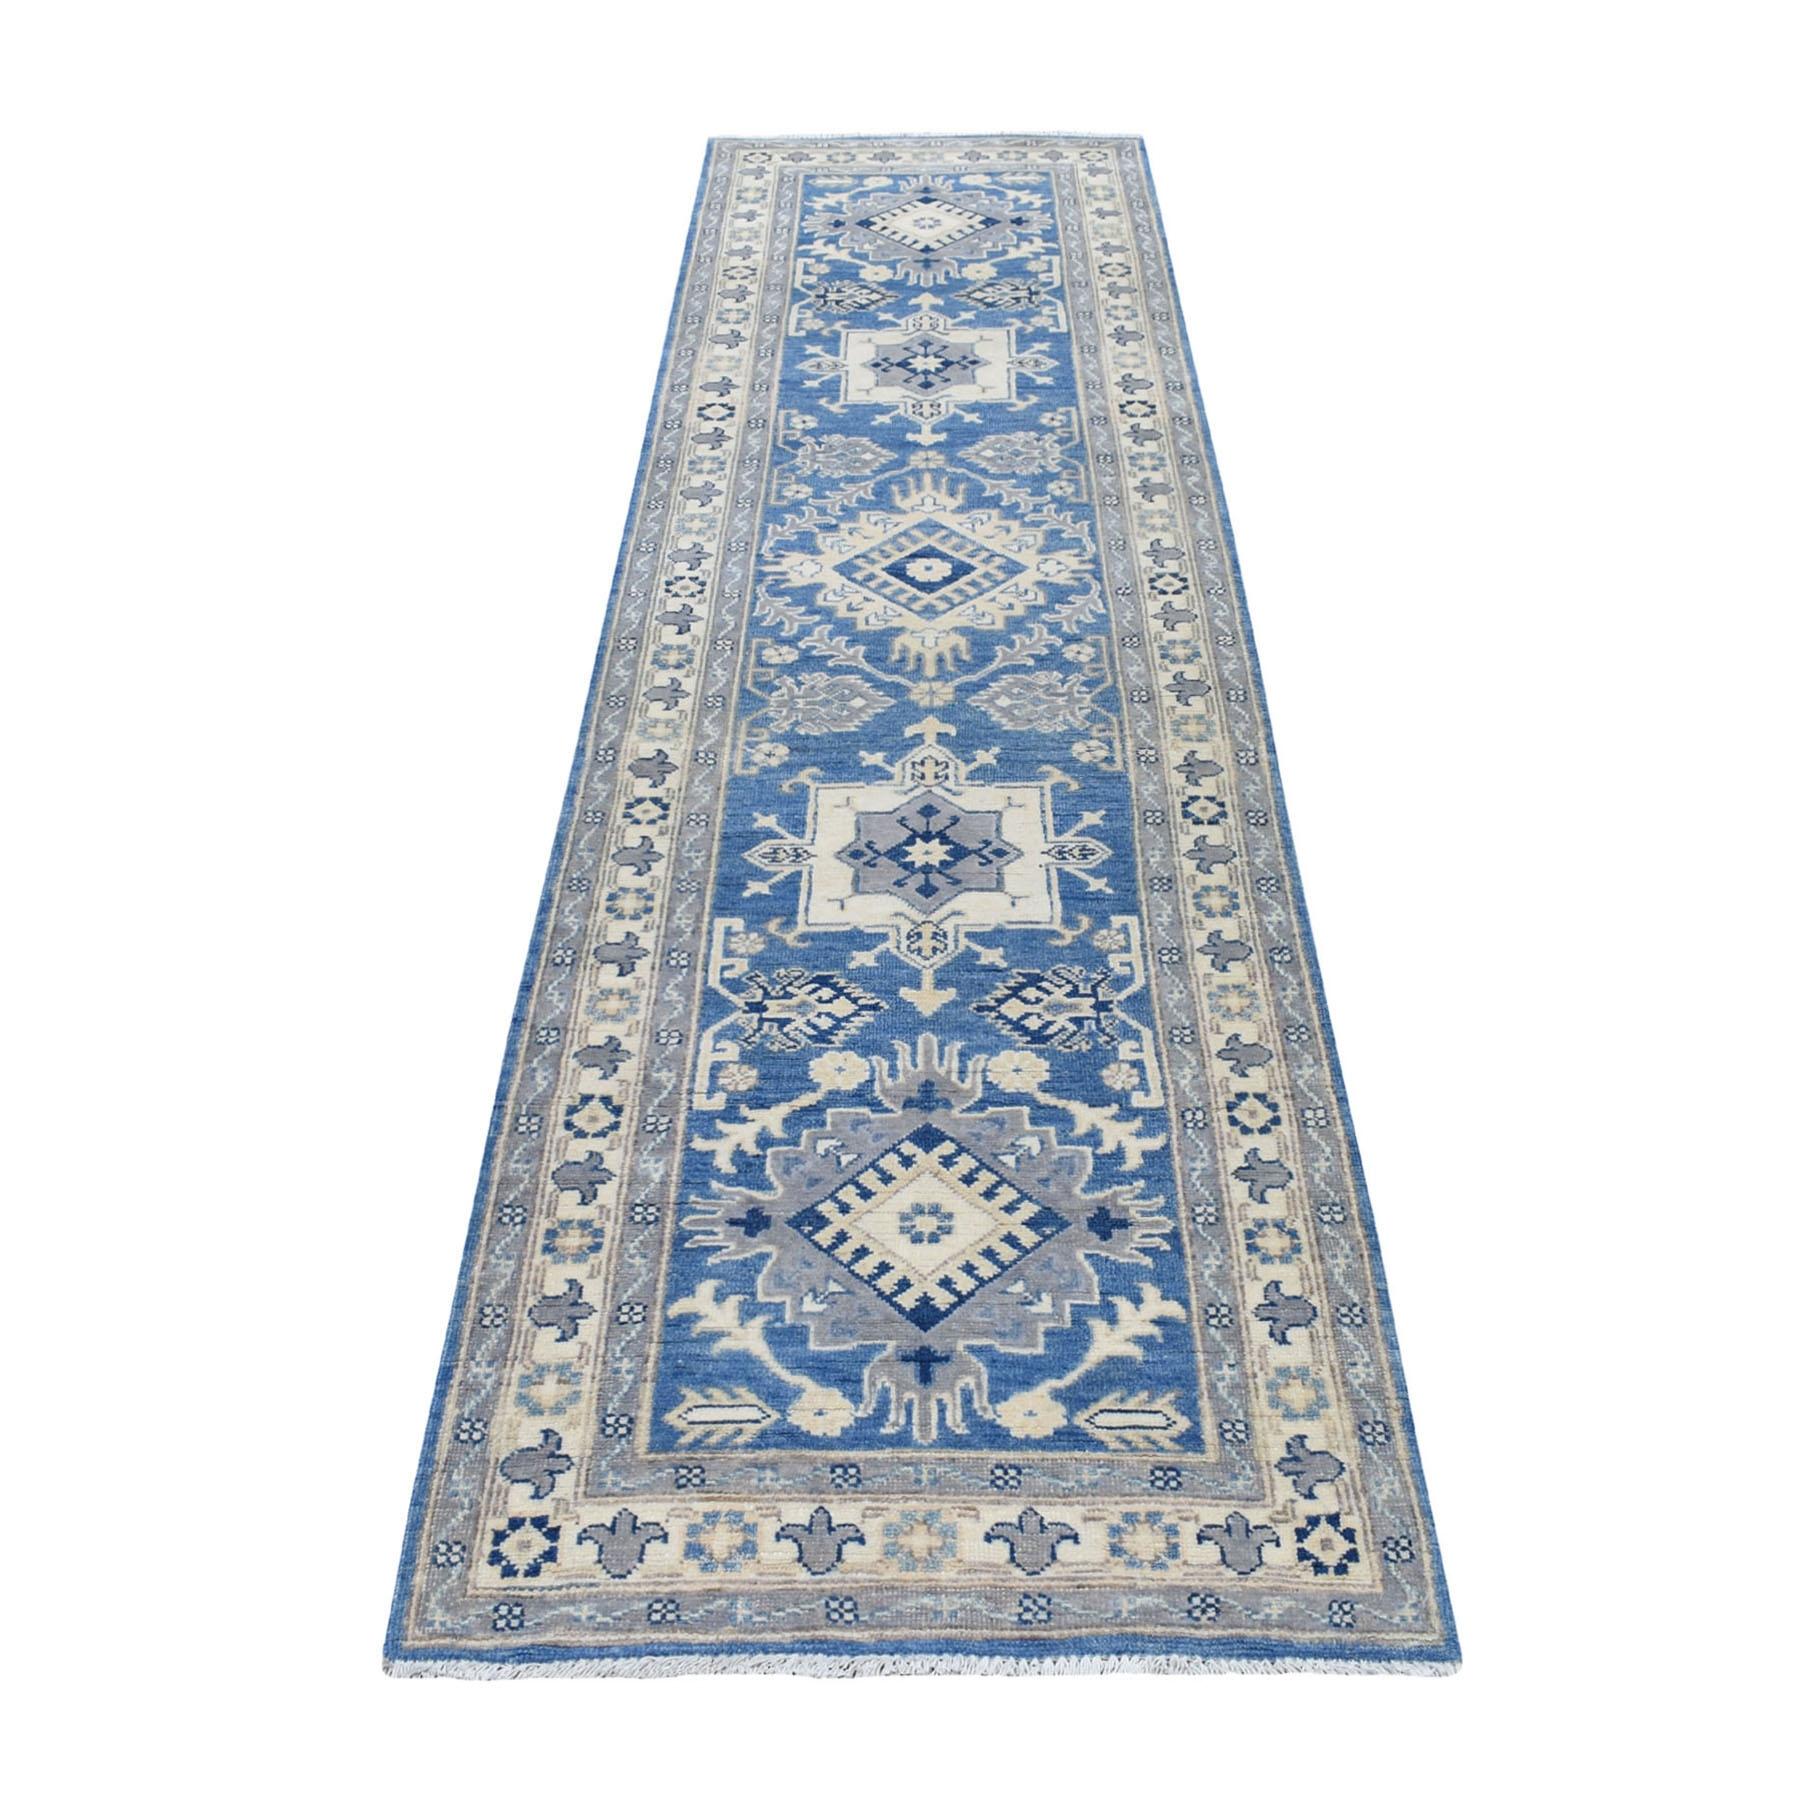 "2'7""x9'6"" Blue Vintage Look Kazak Organic Wool Geometric Design Hand Knotted Runner Oriental Rug"